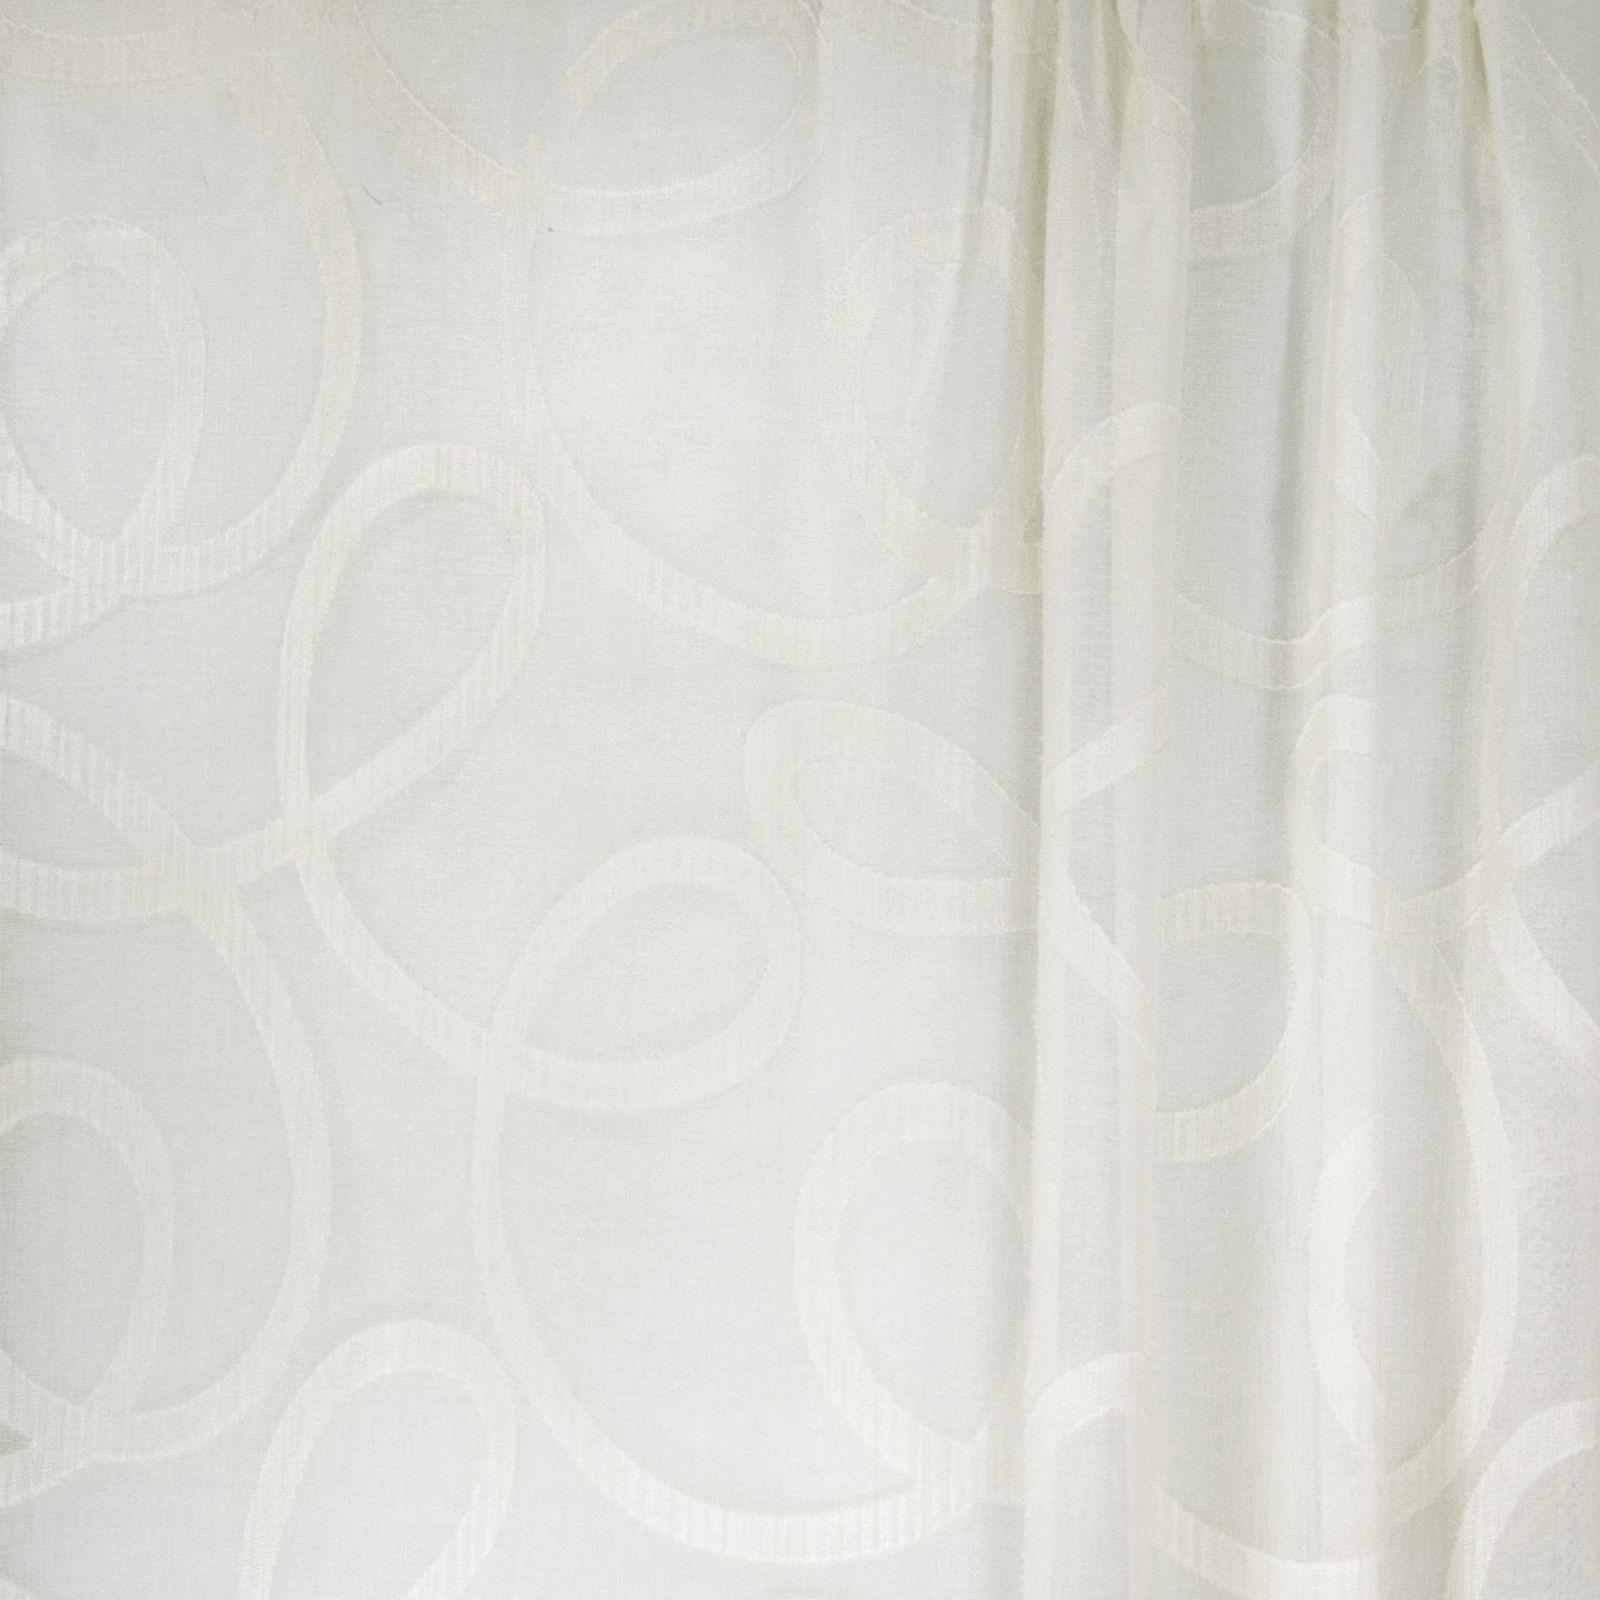 B4405 Antique Sheer Drapery Upholstery Fabric Greenhouse Fabrics